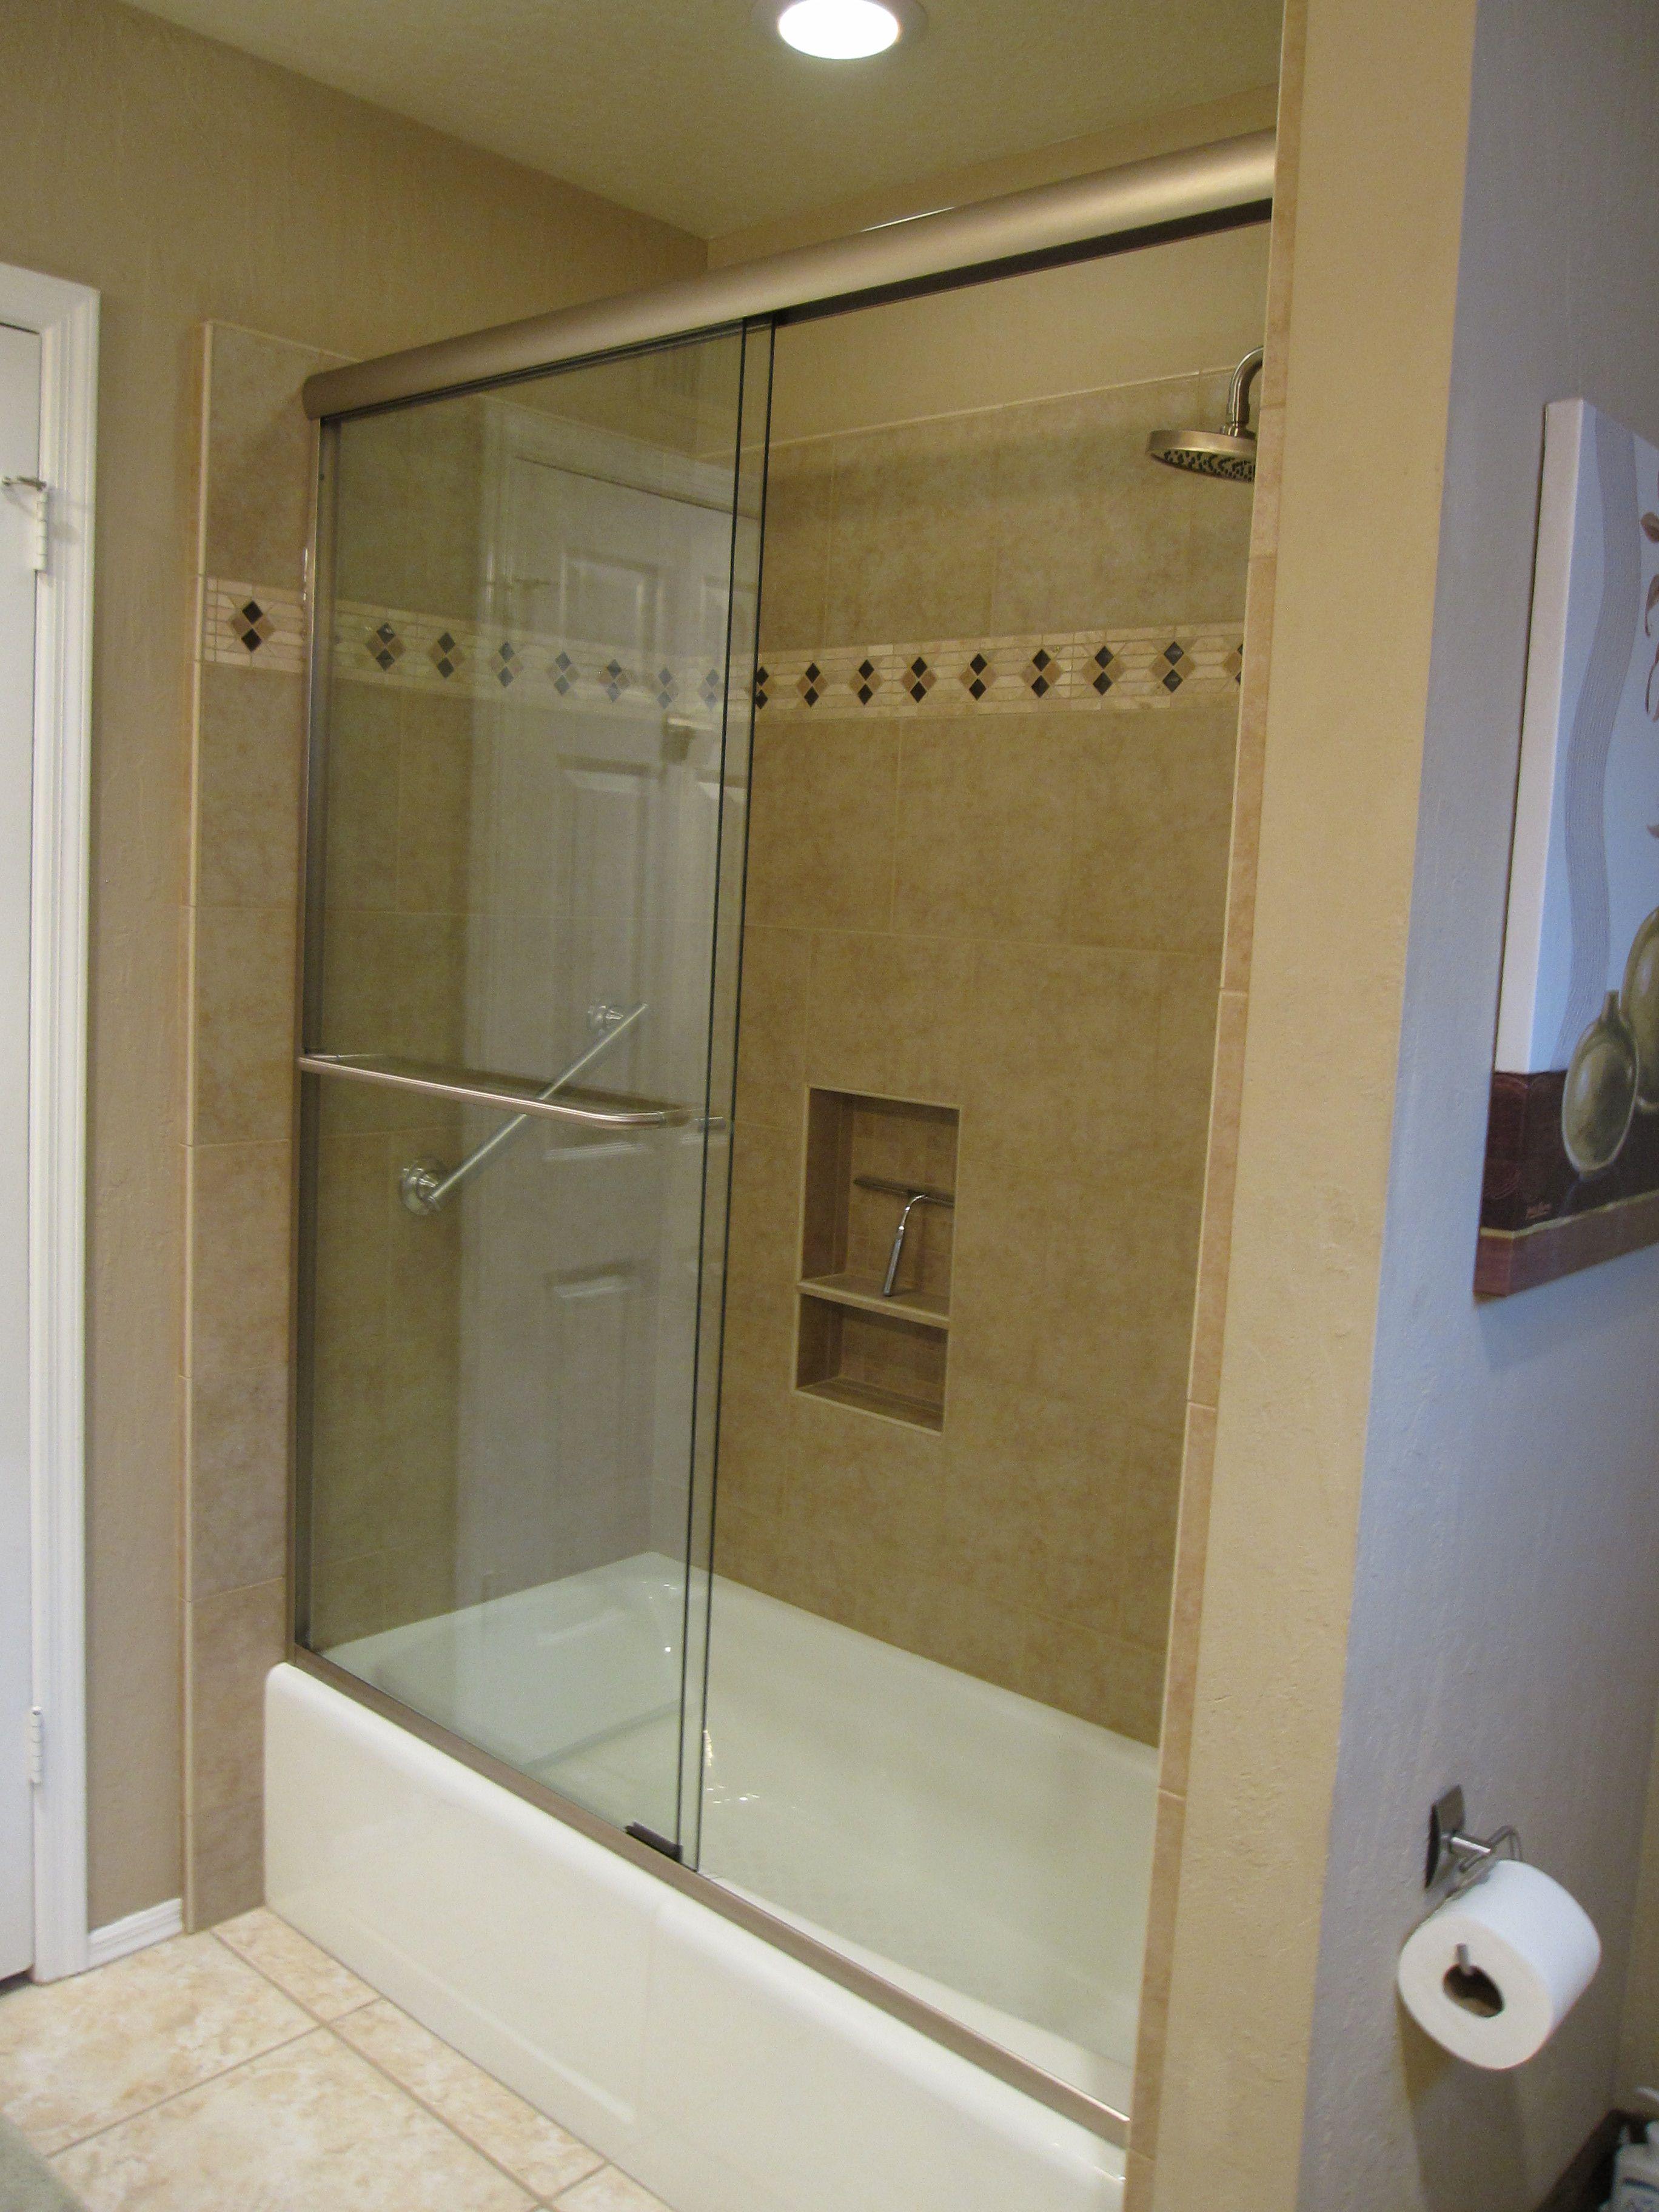 Hall Bath Tub Surround With Sliding Shower Enclosure Tub Surround Shower Enclosure Tub